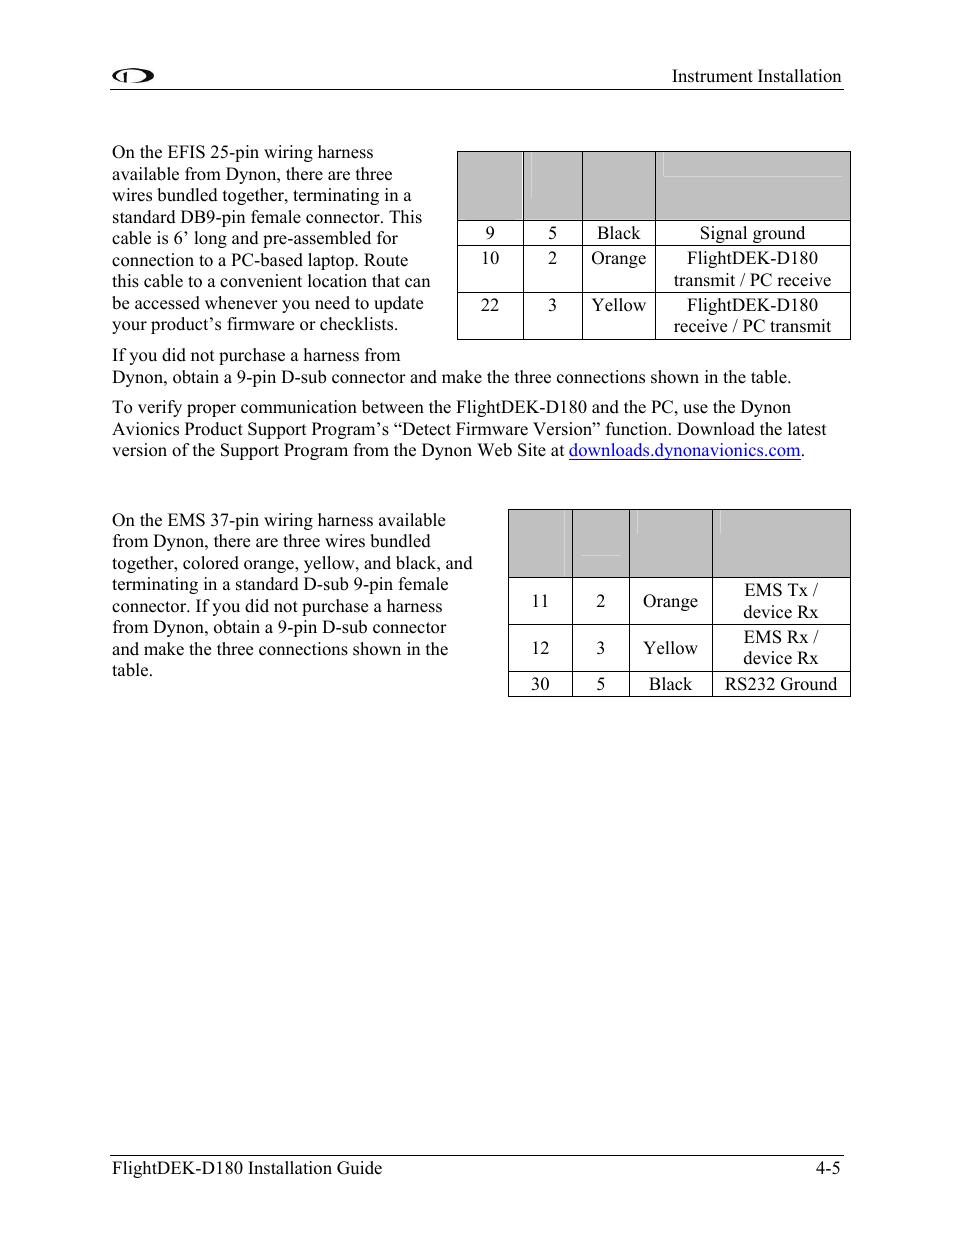 Efis Serial Harness Ems Dynon Avionics Flightdek Wiring Program D180 Installation Guide User Manual Page 43 154